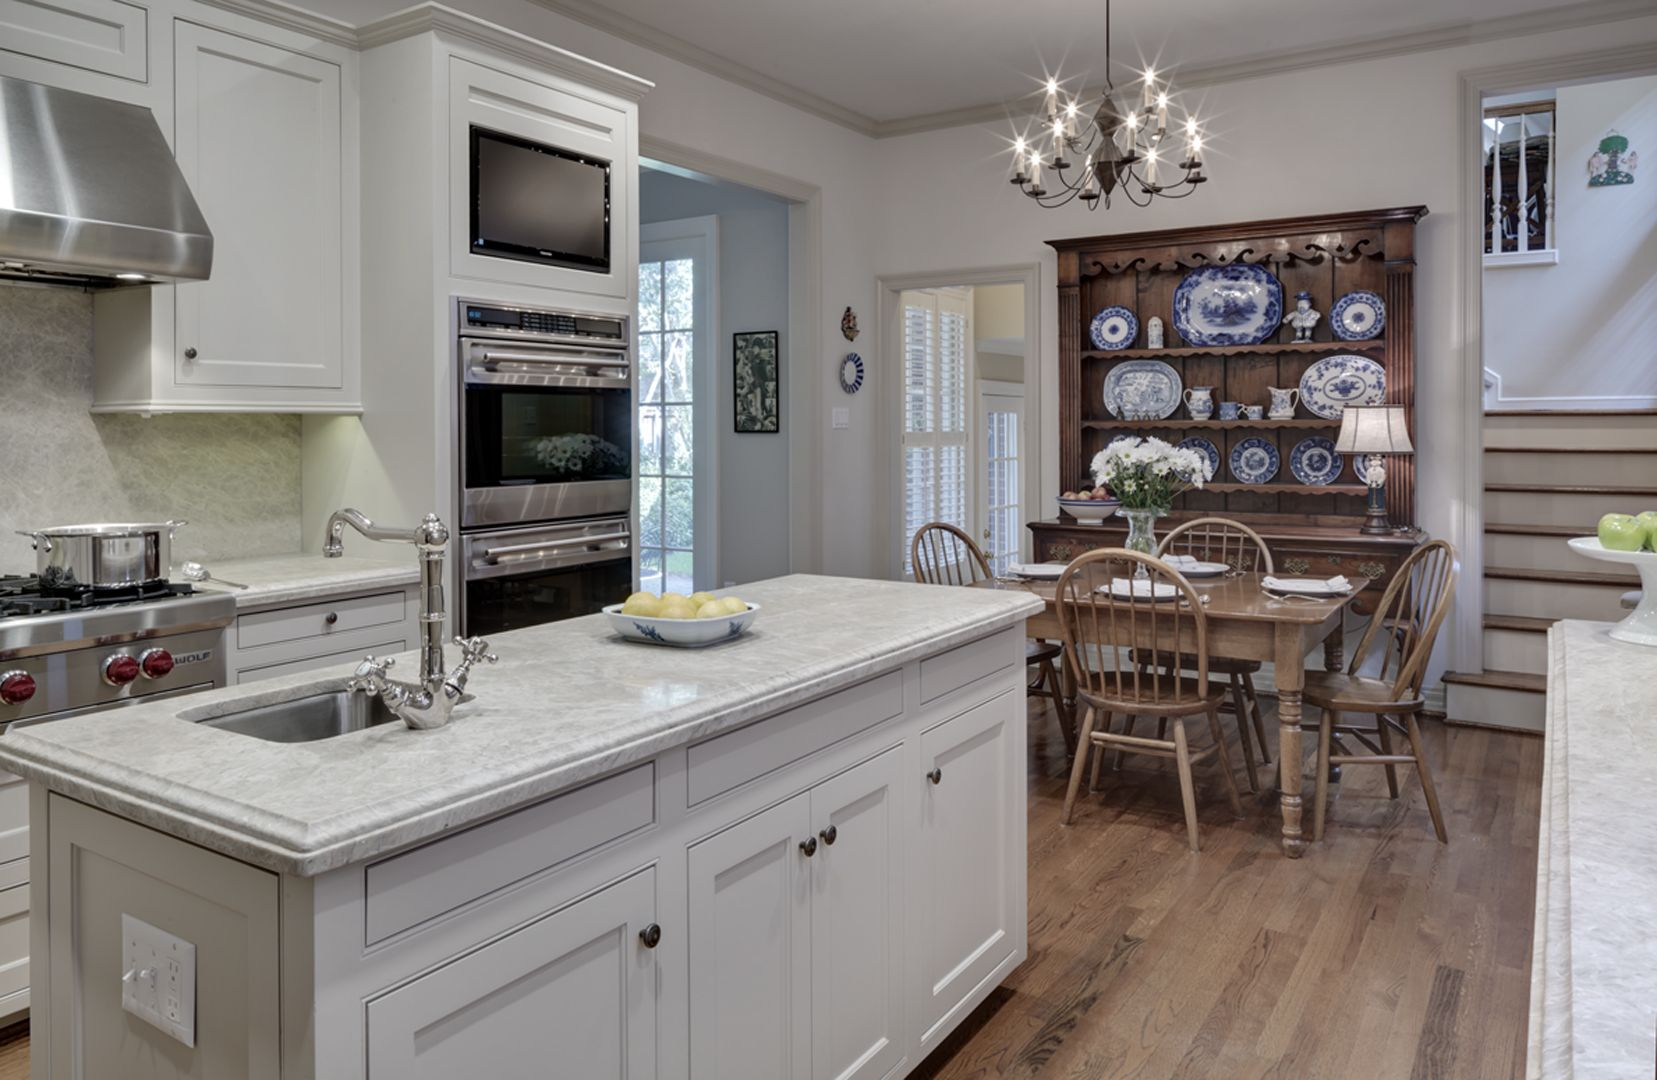 Kitchen Cabinet Color Benjamin Moore Revere Pewter